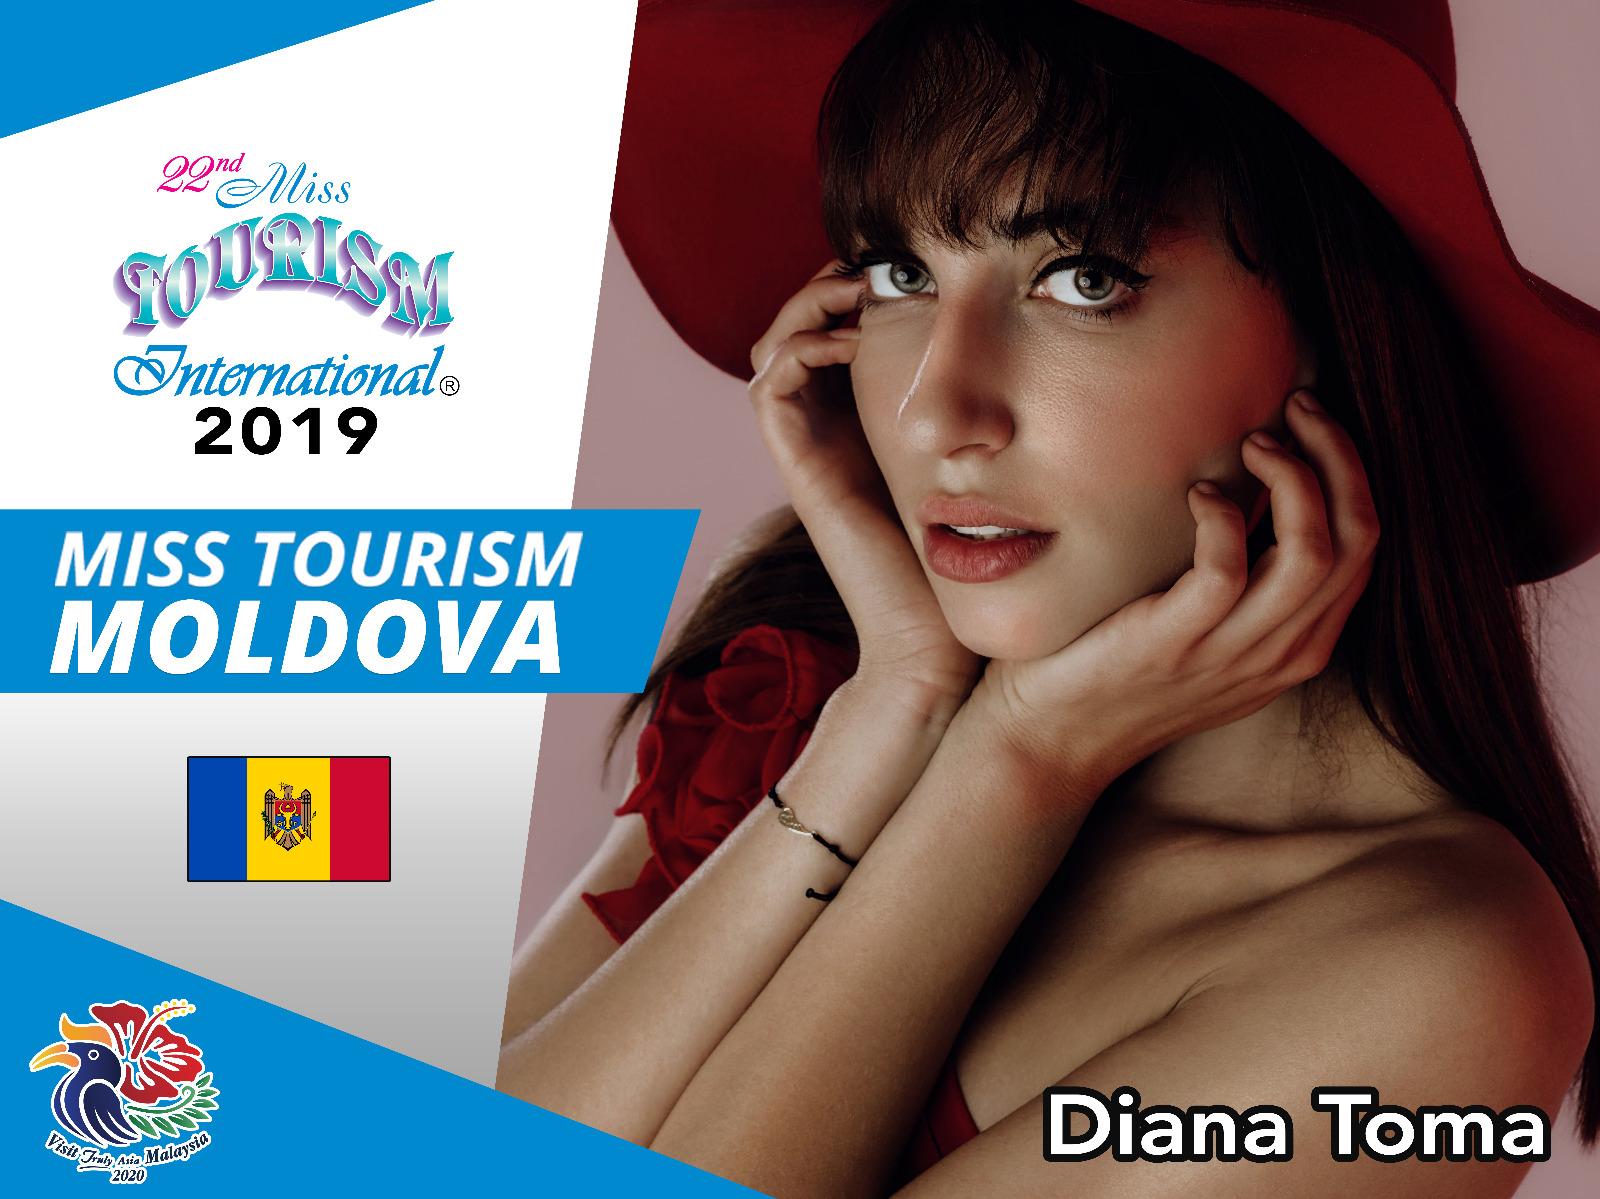 Diana Toma - Miss Tourism Moldova 2019 (4)